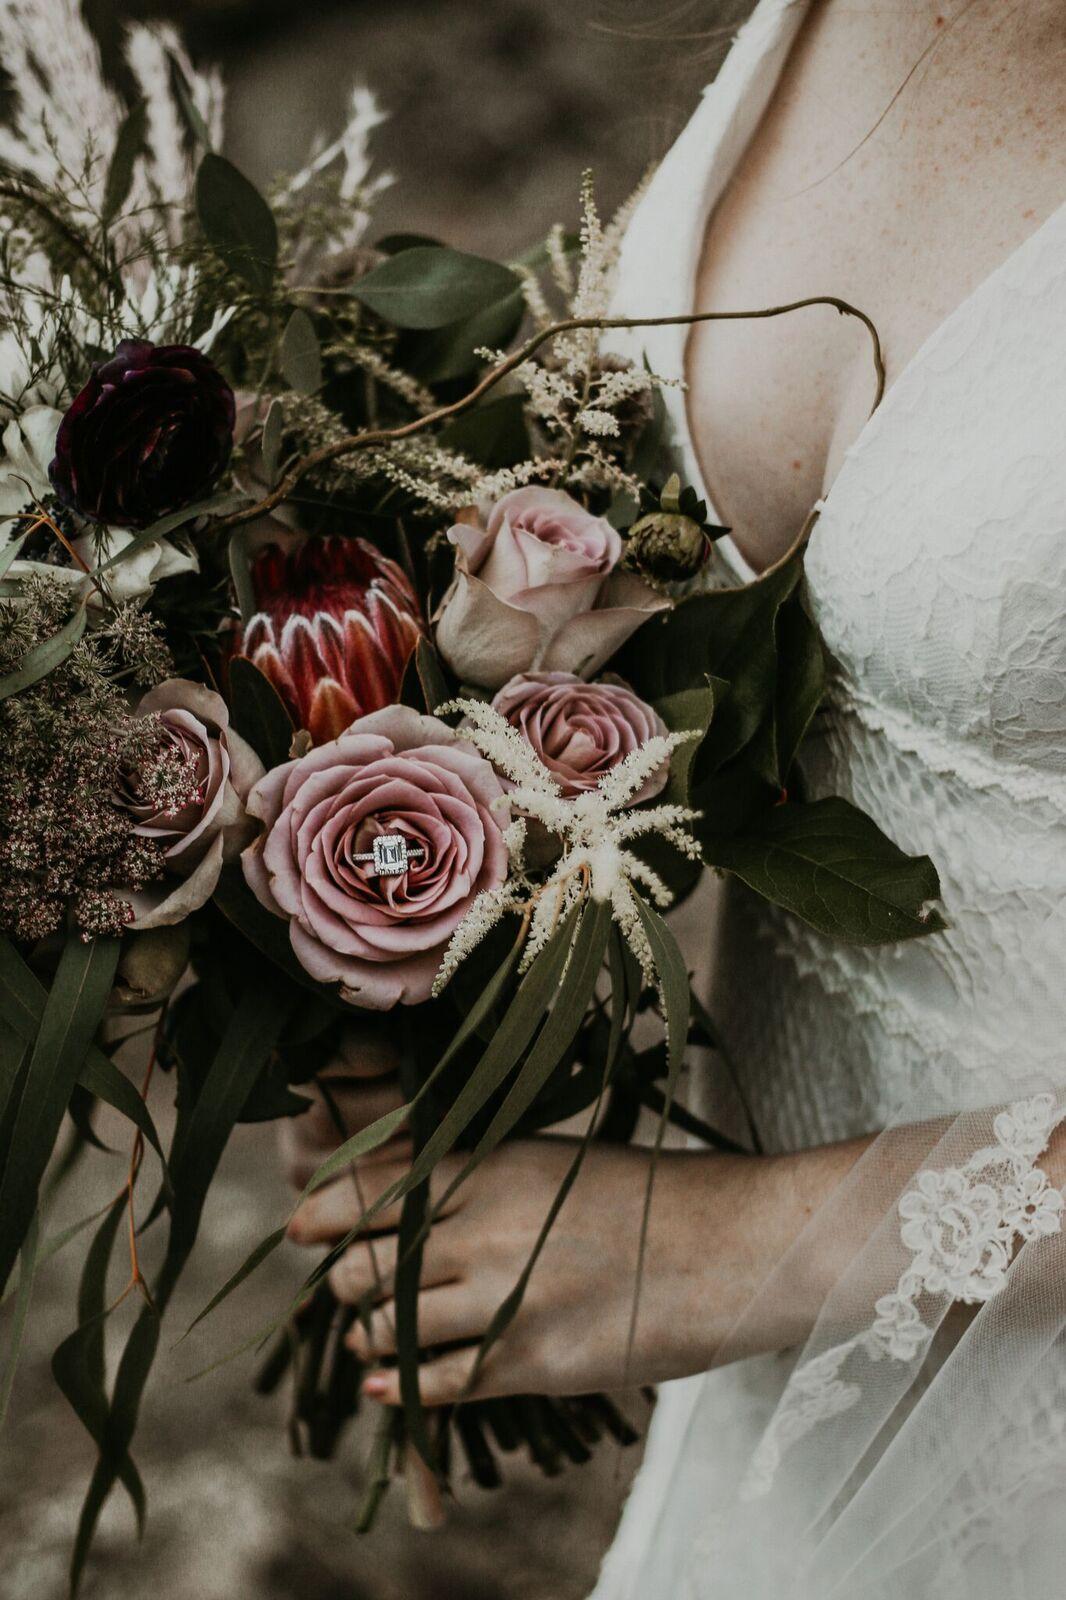 spokane river wedding photo shoot image6